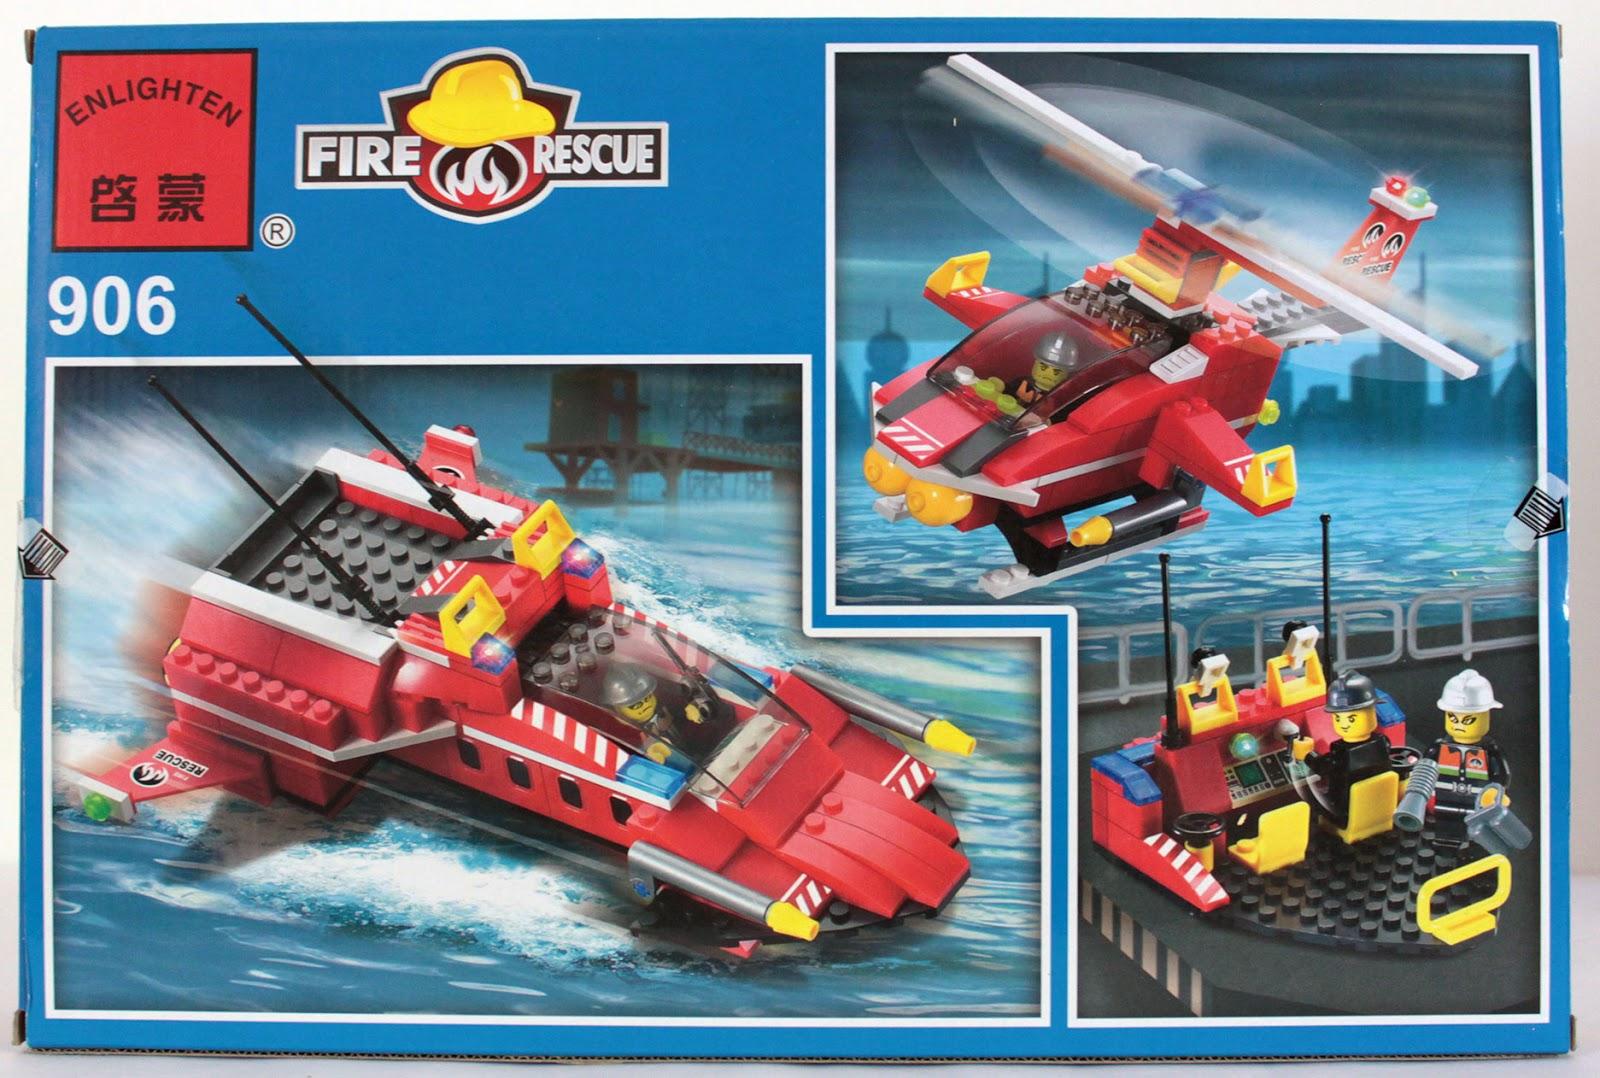 Fire Rescue Boat Lego Best Boats 2017